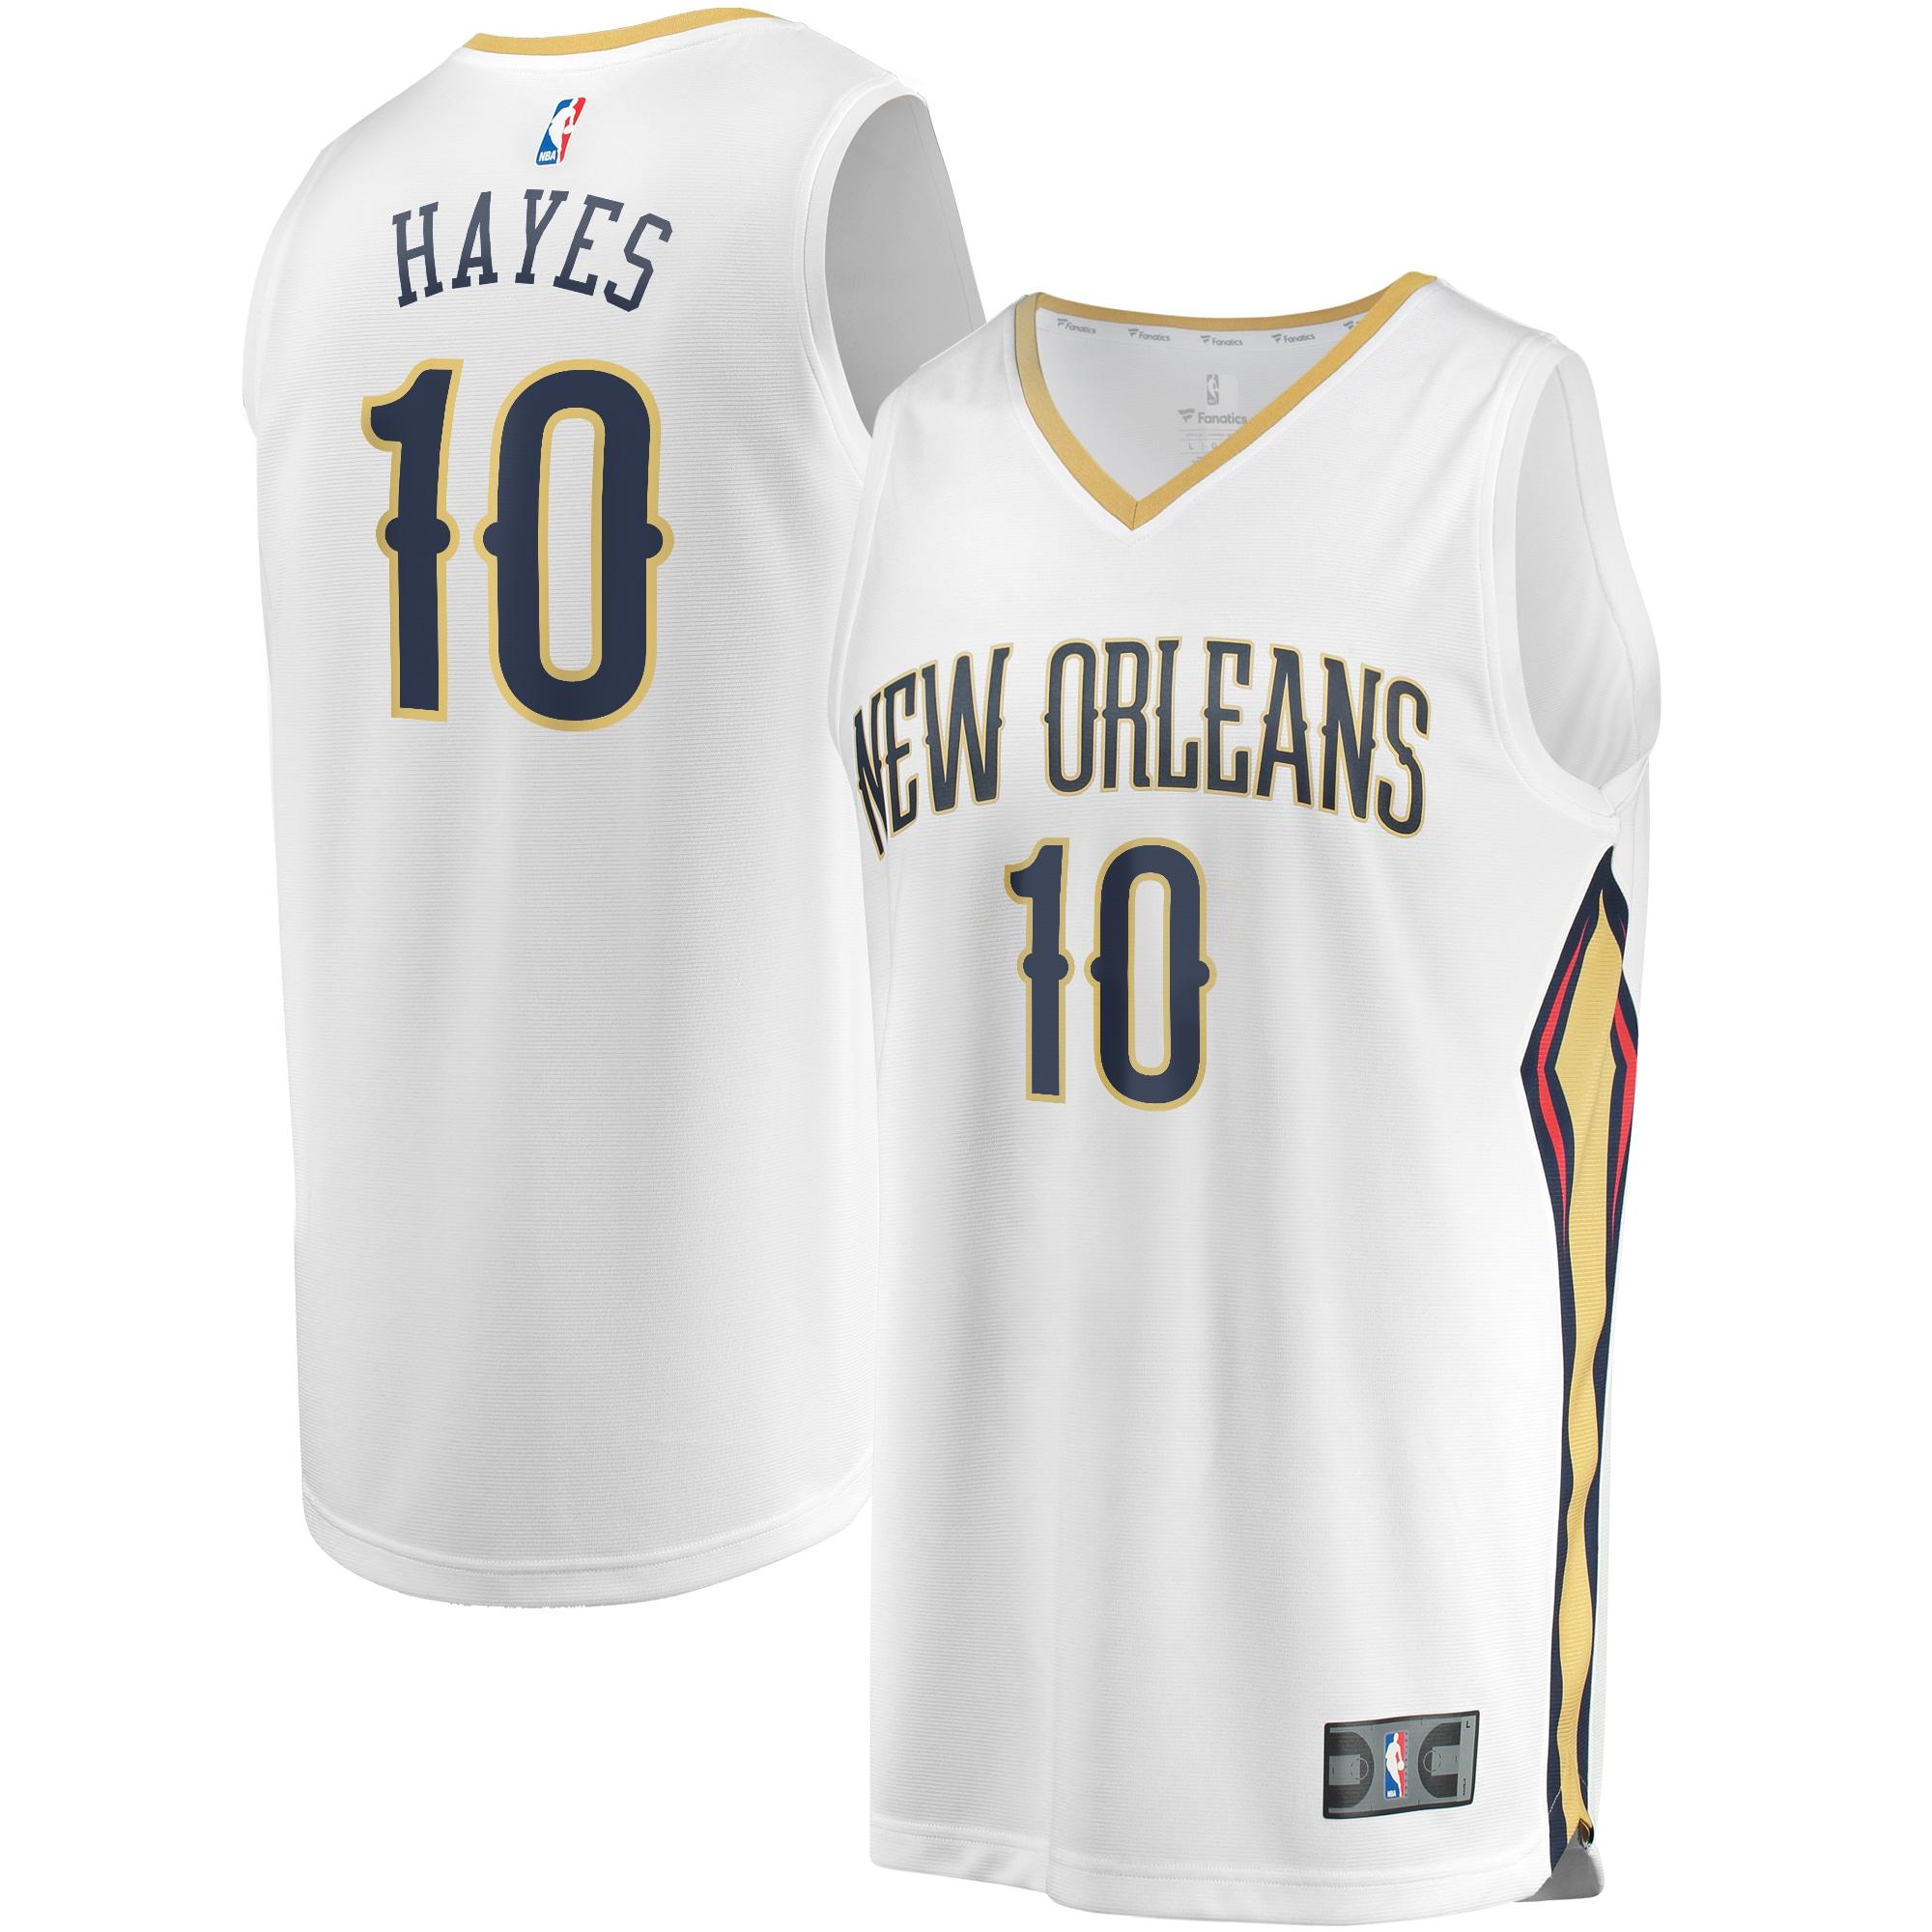 Jaxson Hayes New Orleans Pelicans Fanatics Branded Youth Fast Break Replica Jersey White - Association Edition